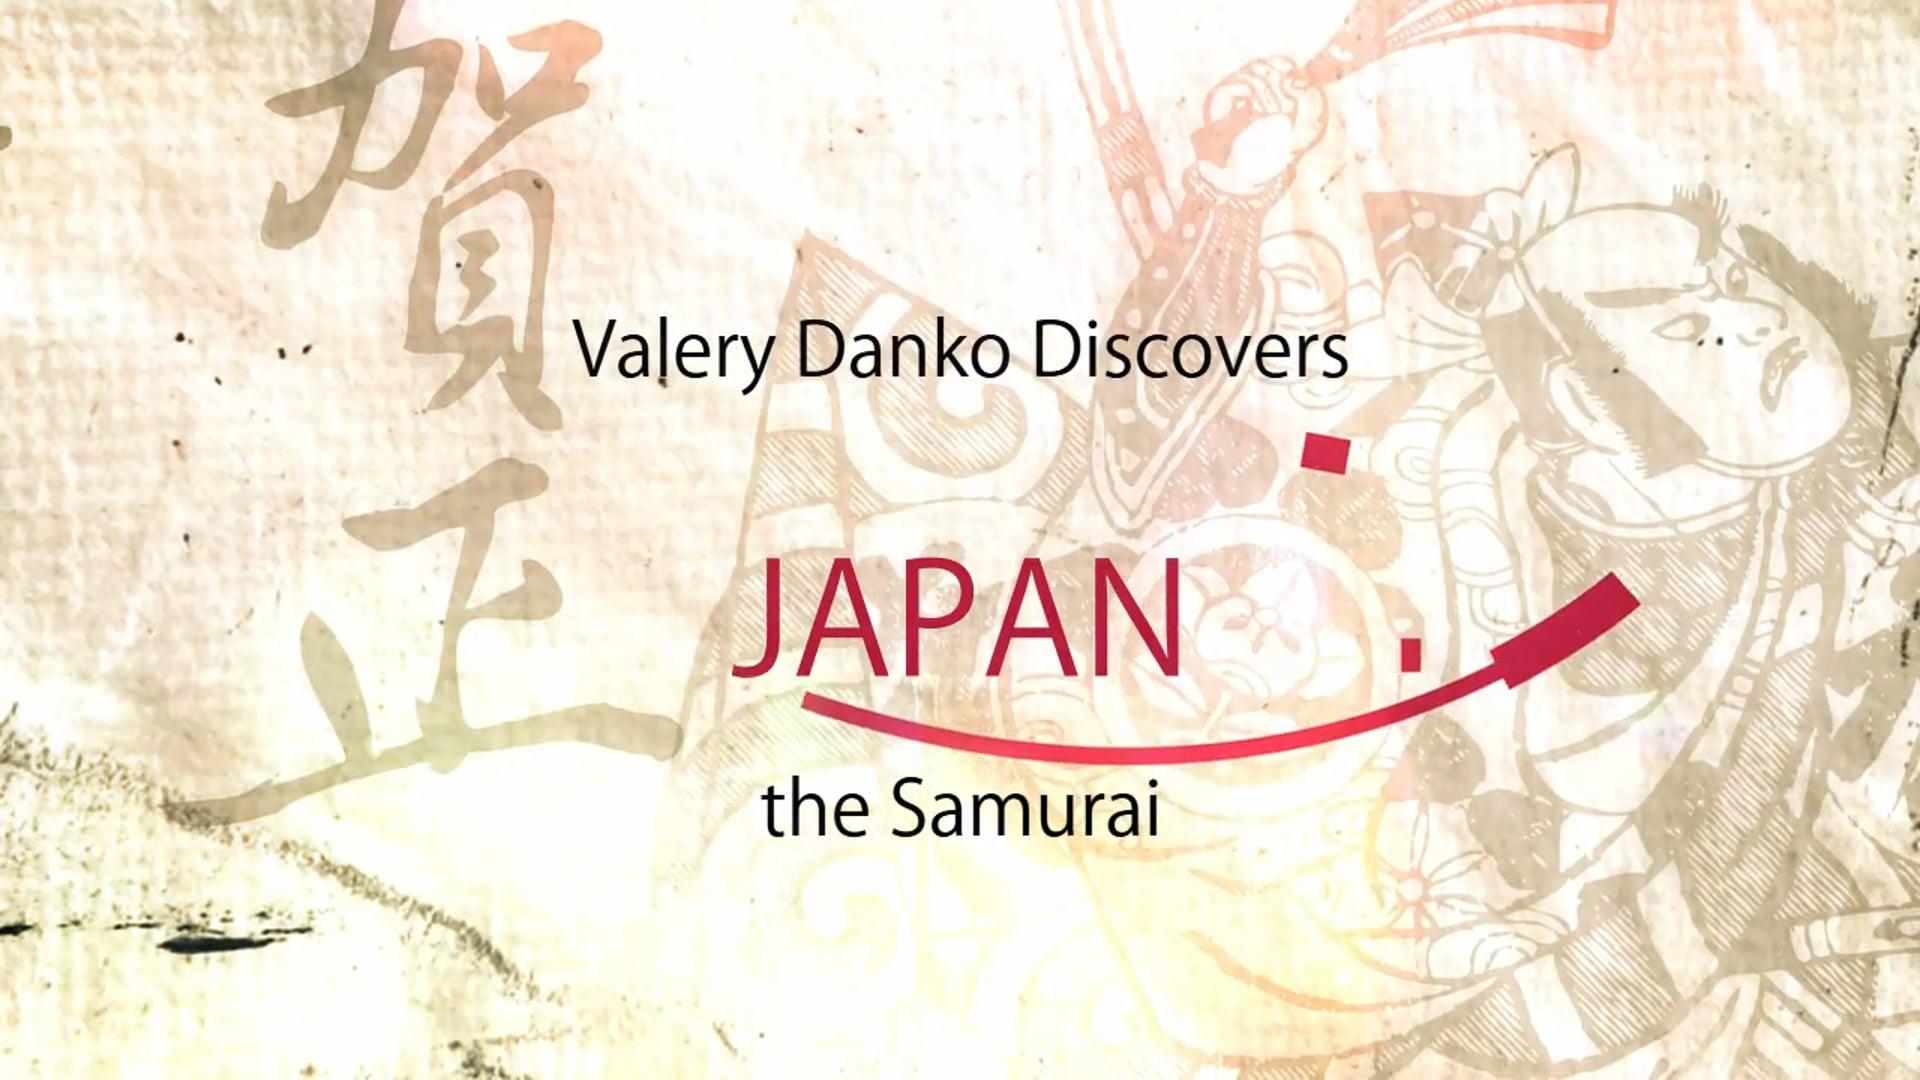 Valery Danko Discovers Japan: the Samurai - The Trailer